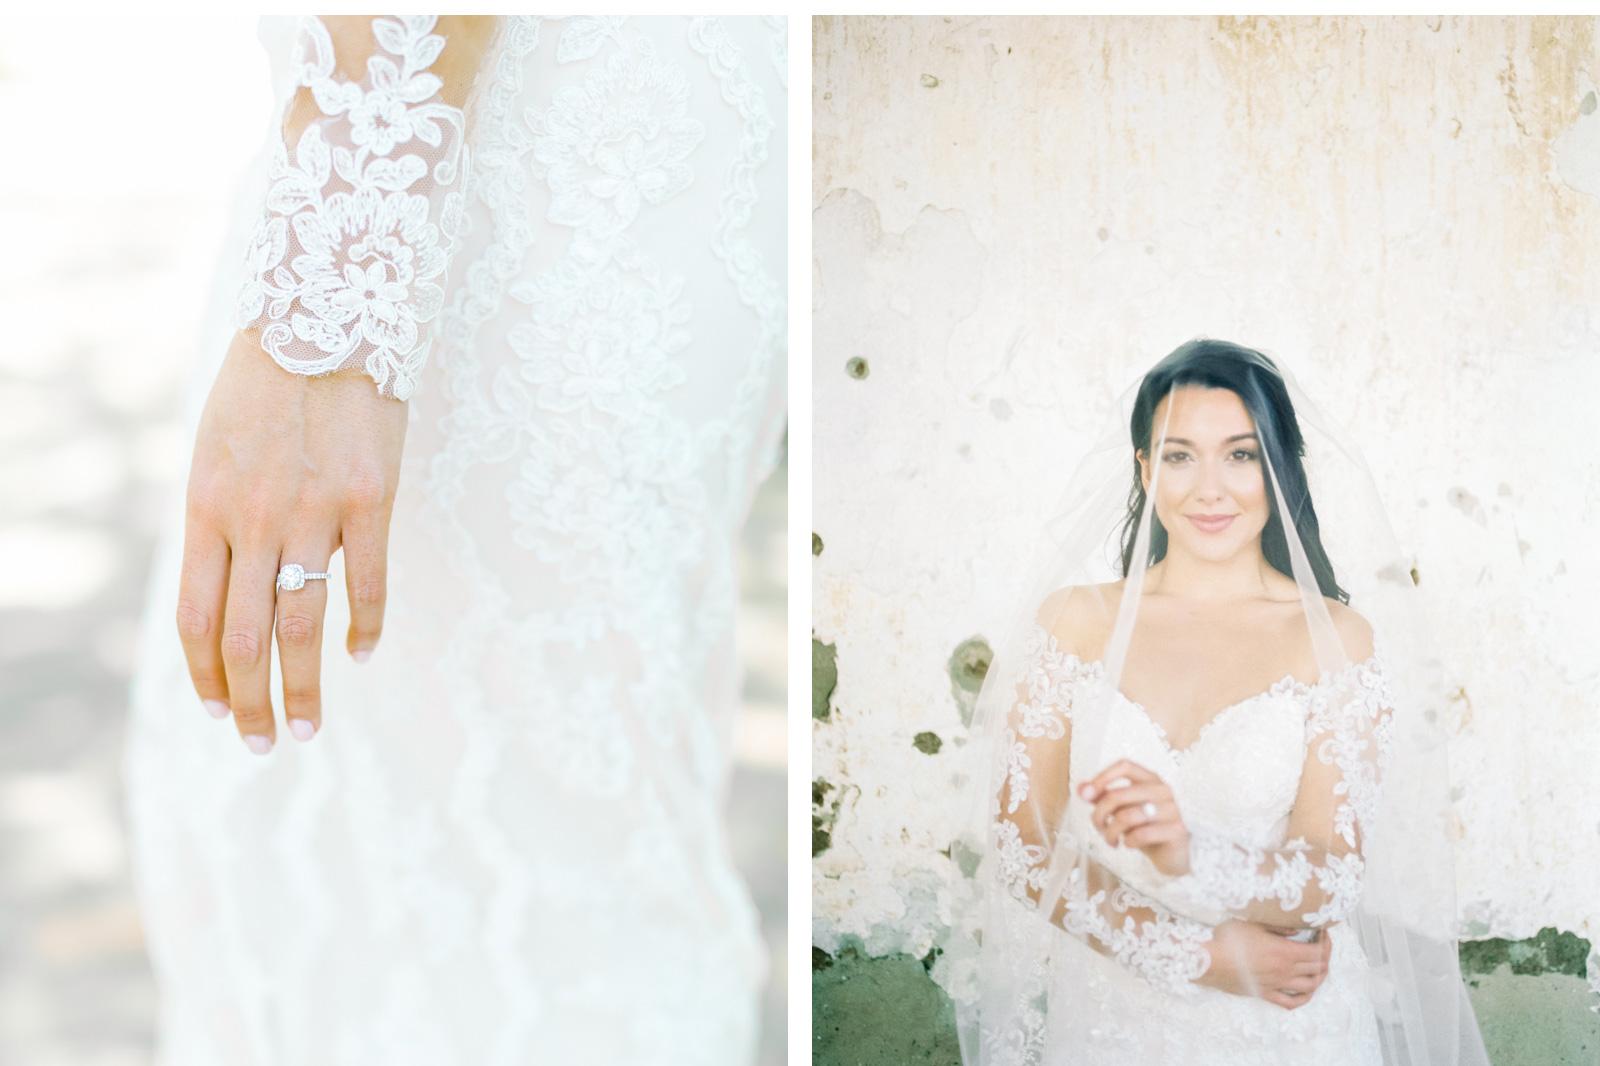 San-Diego-Weddings-Natalie-Schutt-Photography_05.jpg